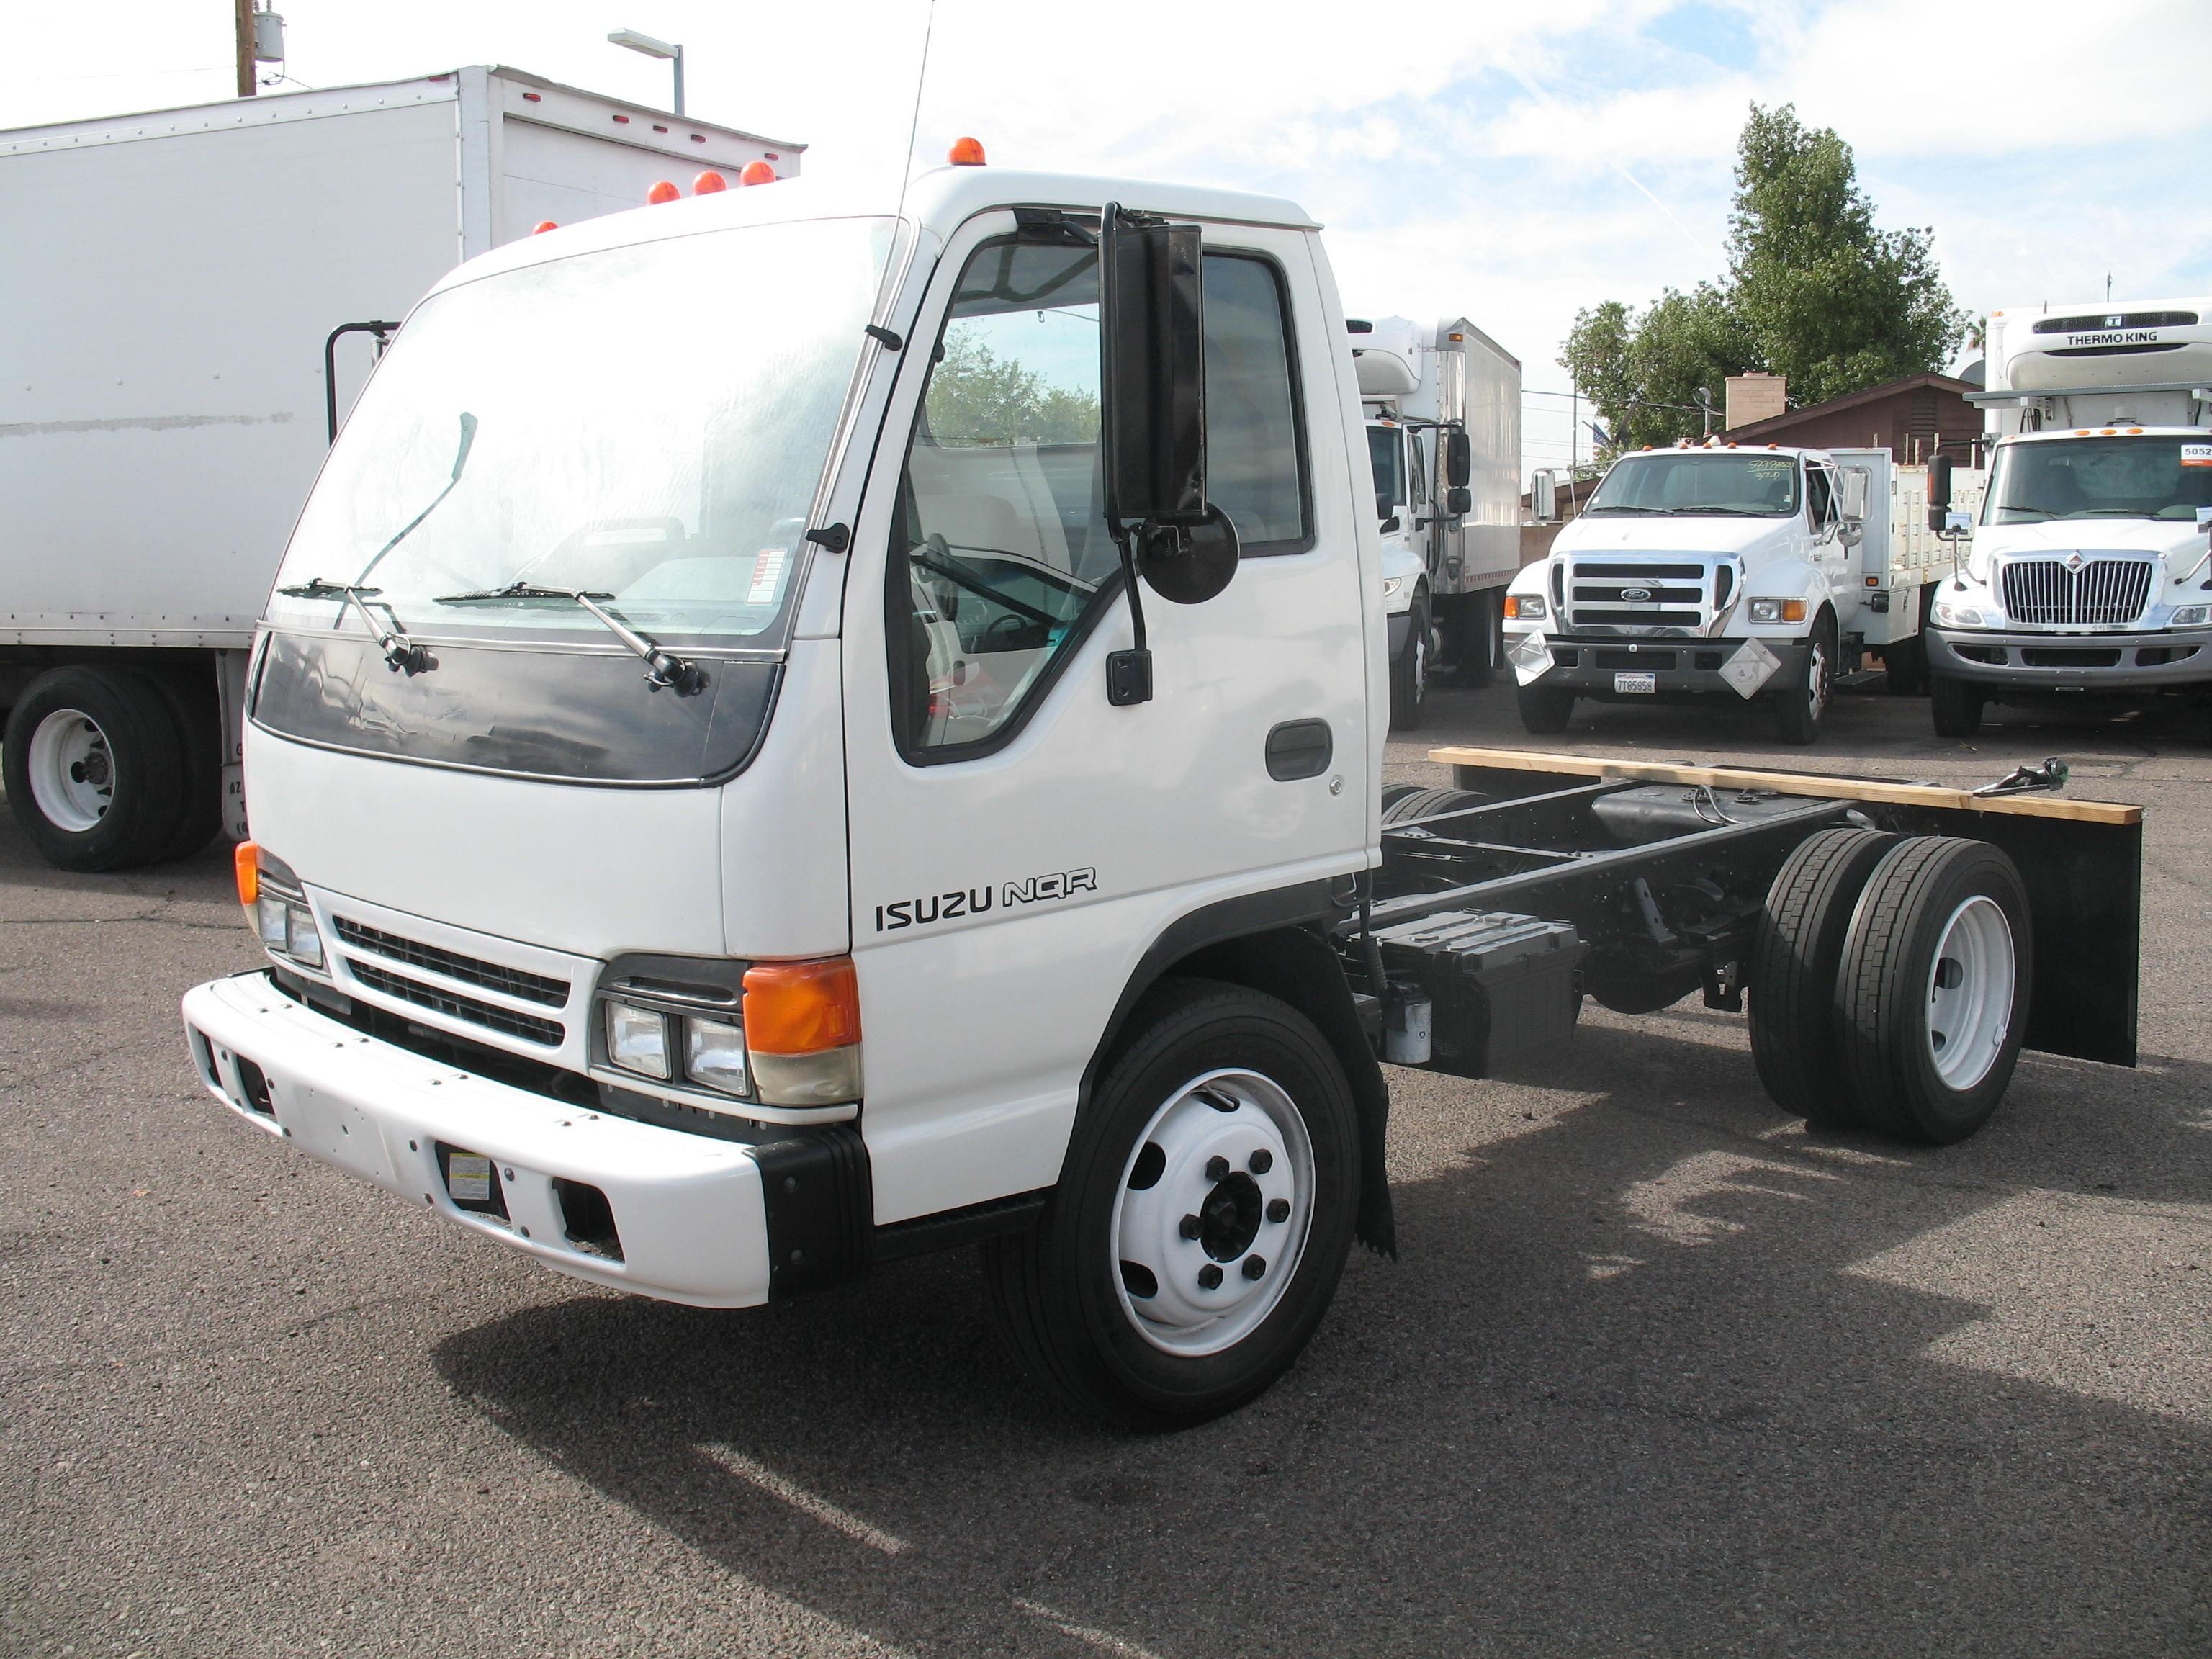 Used, 2005, Isuzu, NQR Diesel, Cab / Chassis Trucks